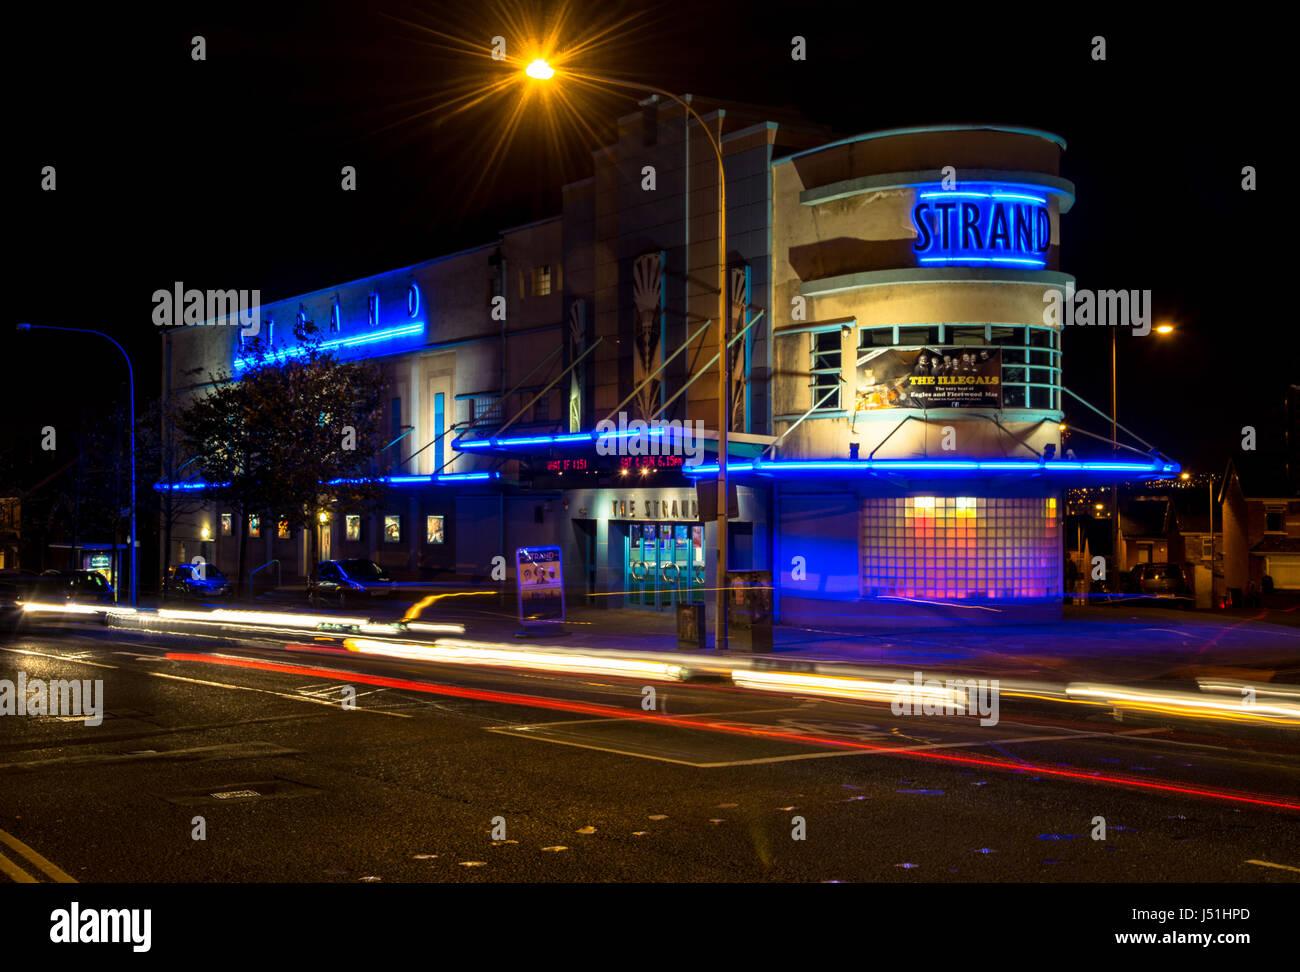 Strand Cinema East Belfast Northern Ireland - Stock Image